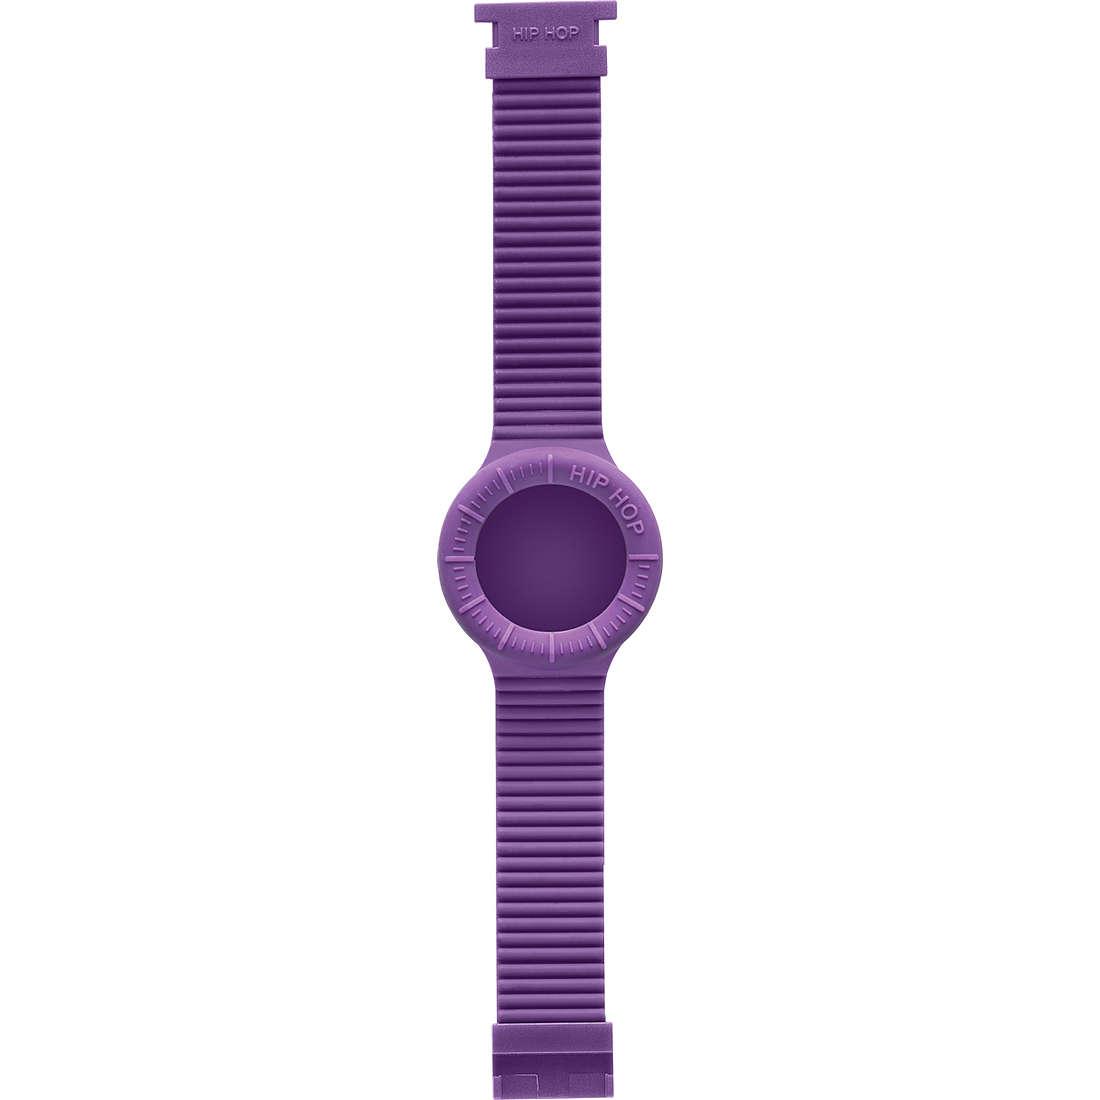 watch watch strap unisex Hip Hop Multifunzione HBU0182